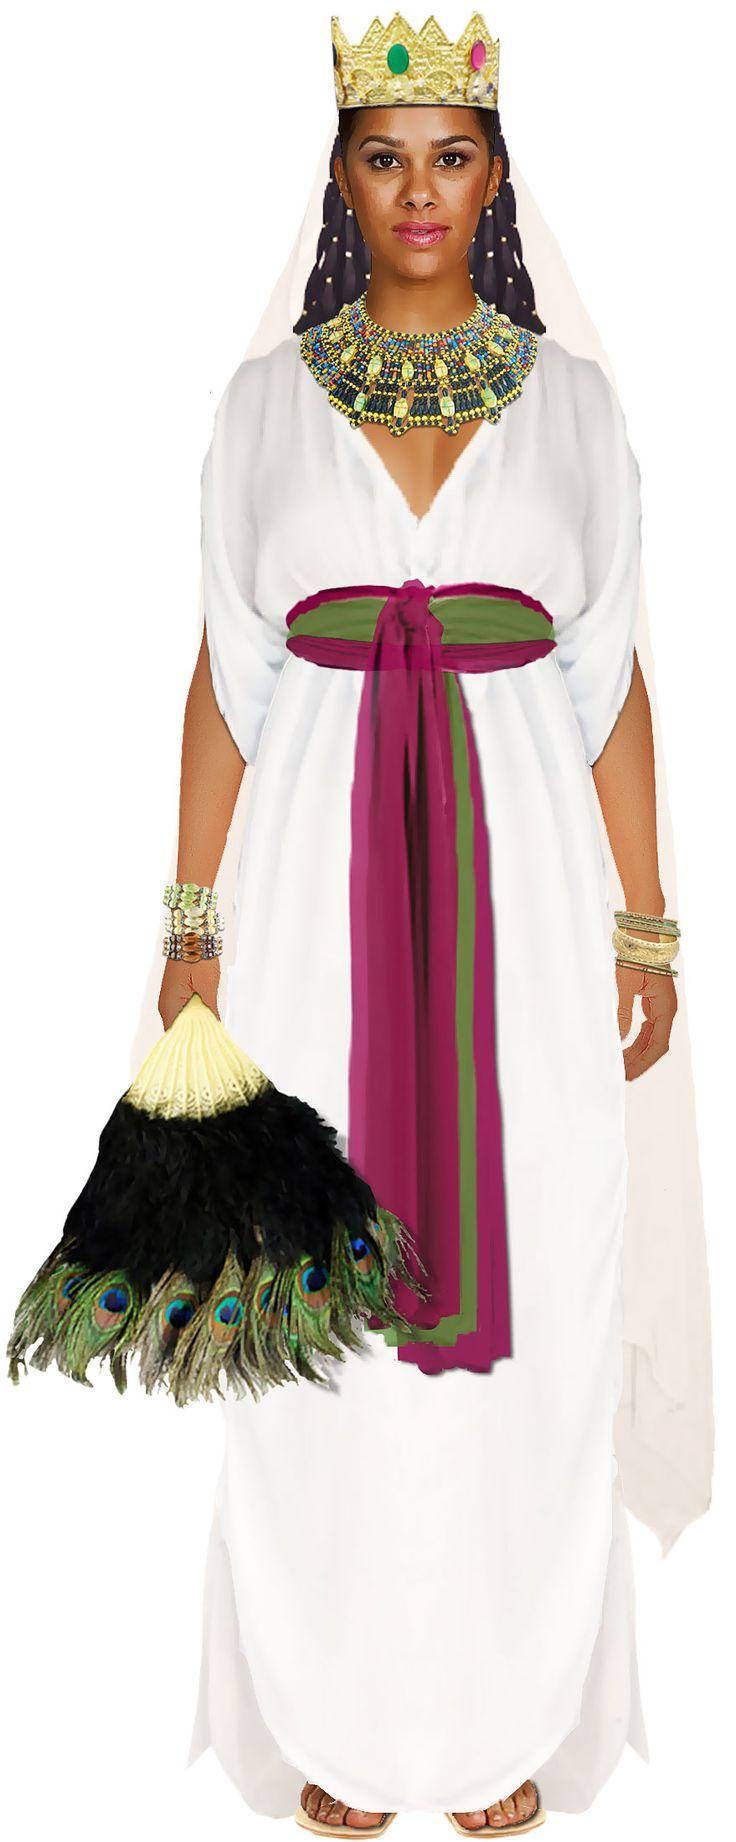 30 best Queen costumes images on Pinterest